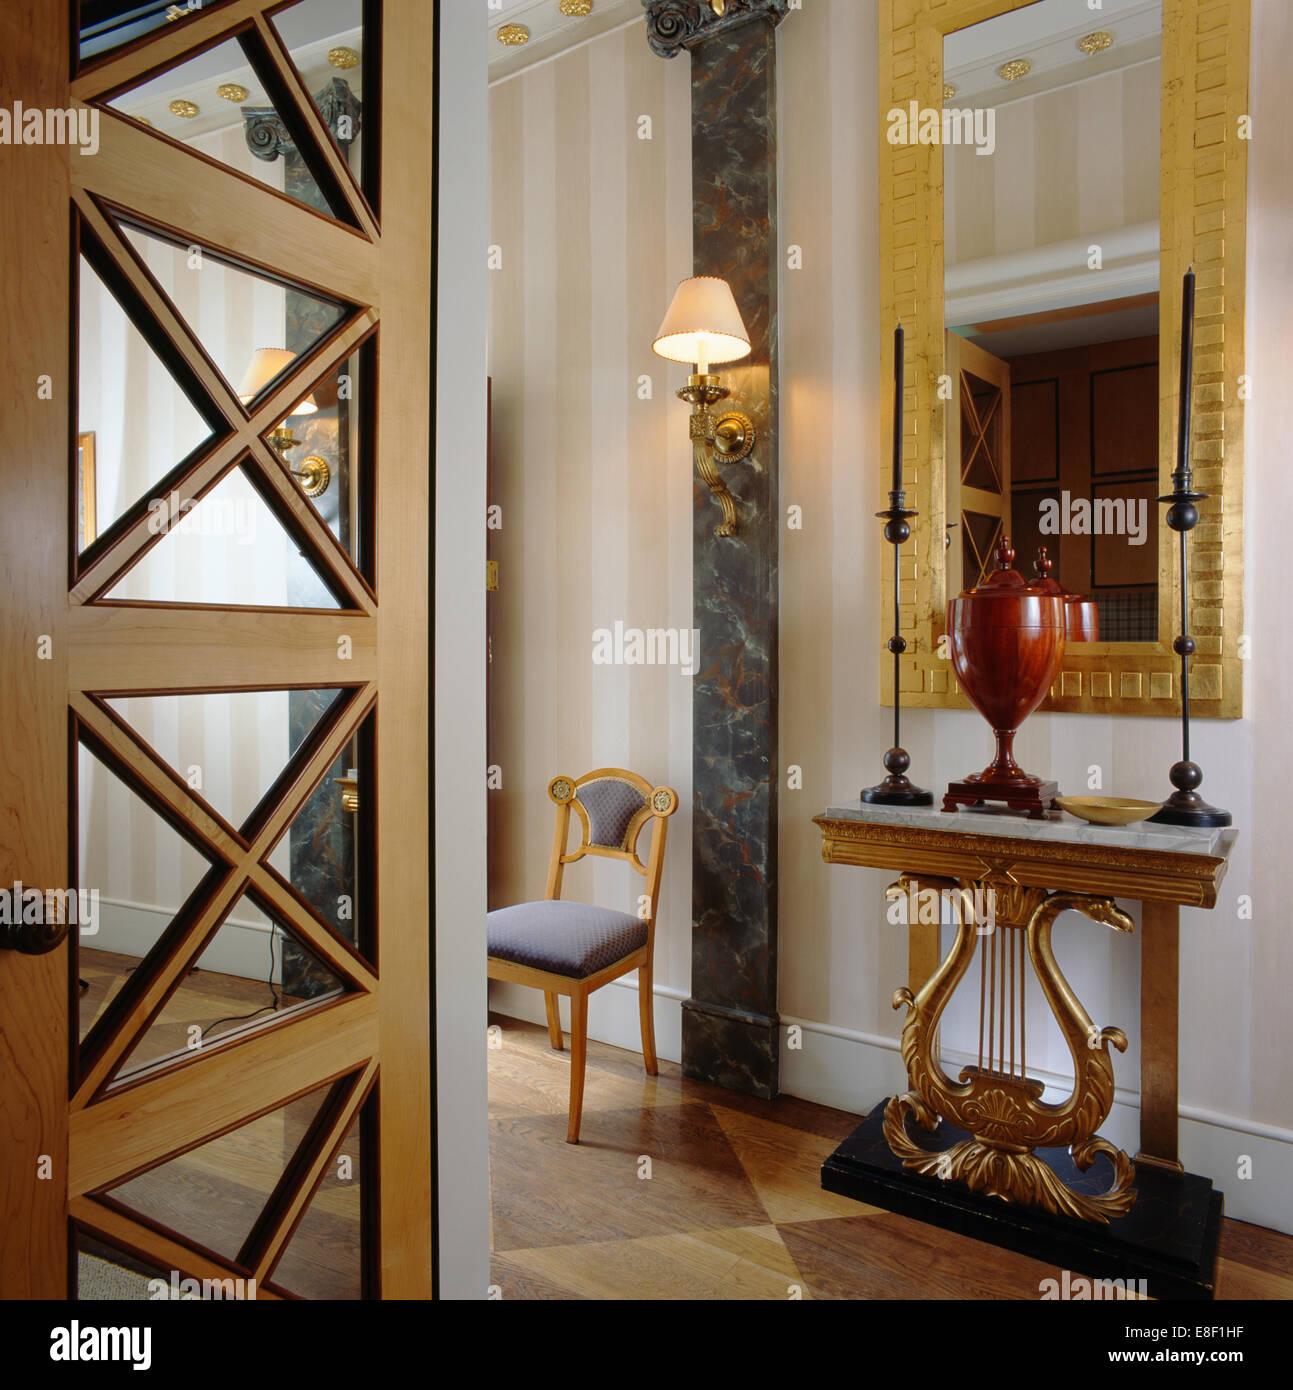 interiors town halls domestic stockfotos interiors town halls domestic bilder alamy. Black Bedroom Furniture Sets. Home Design Ideas